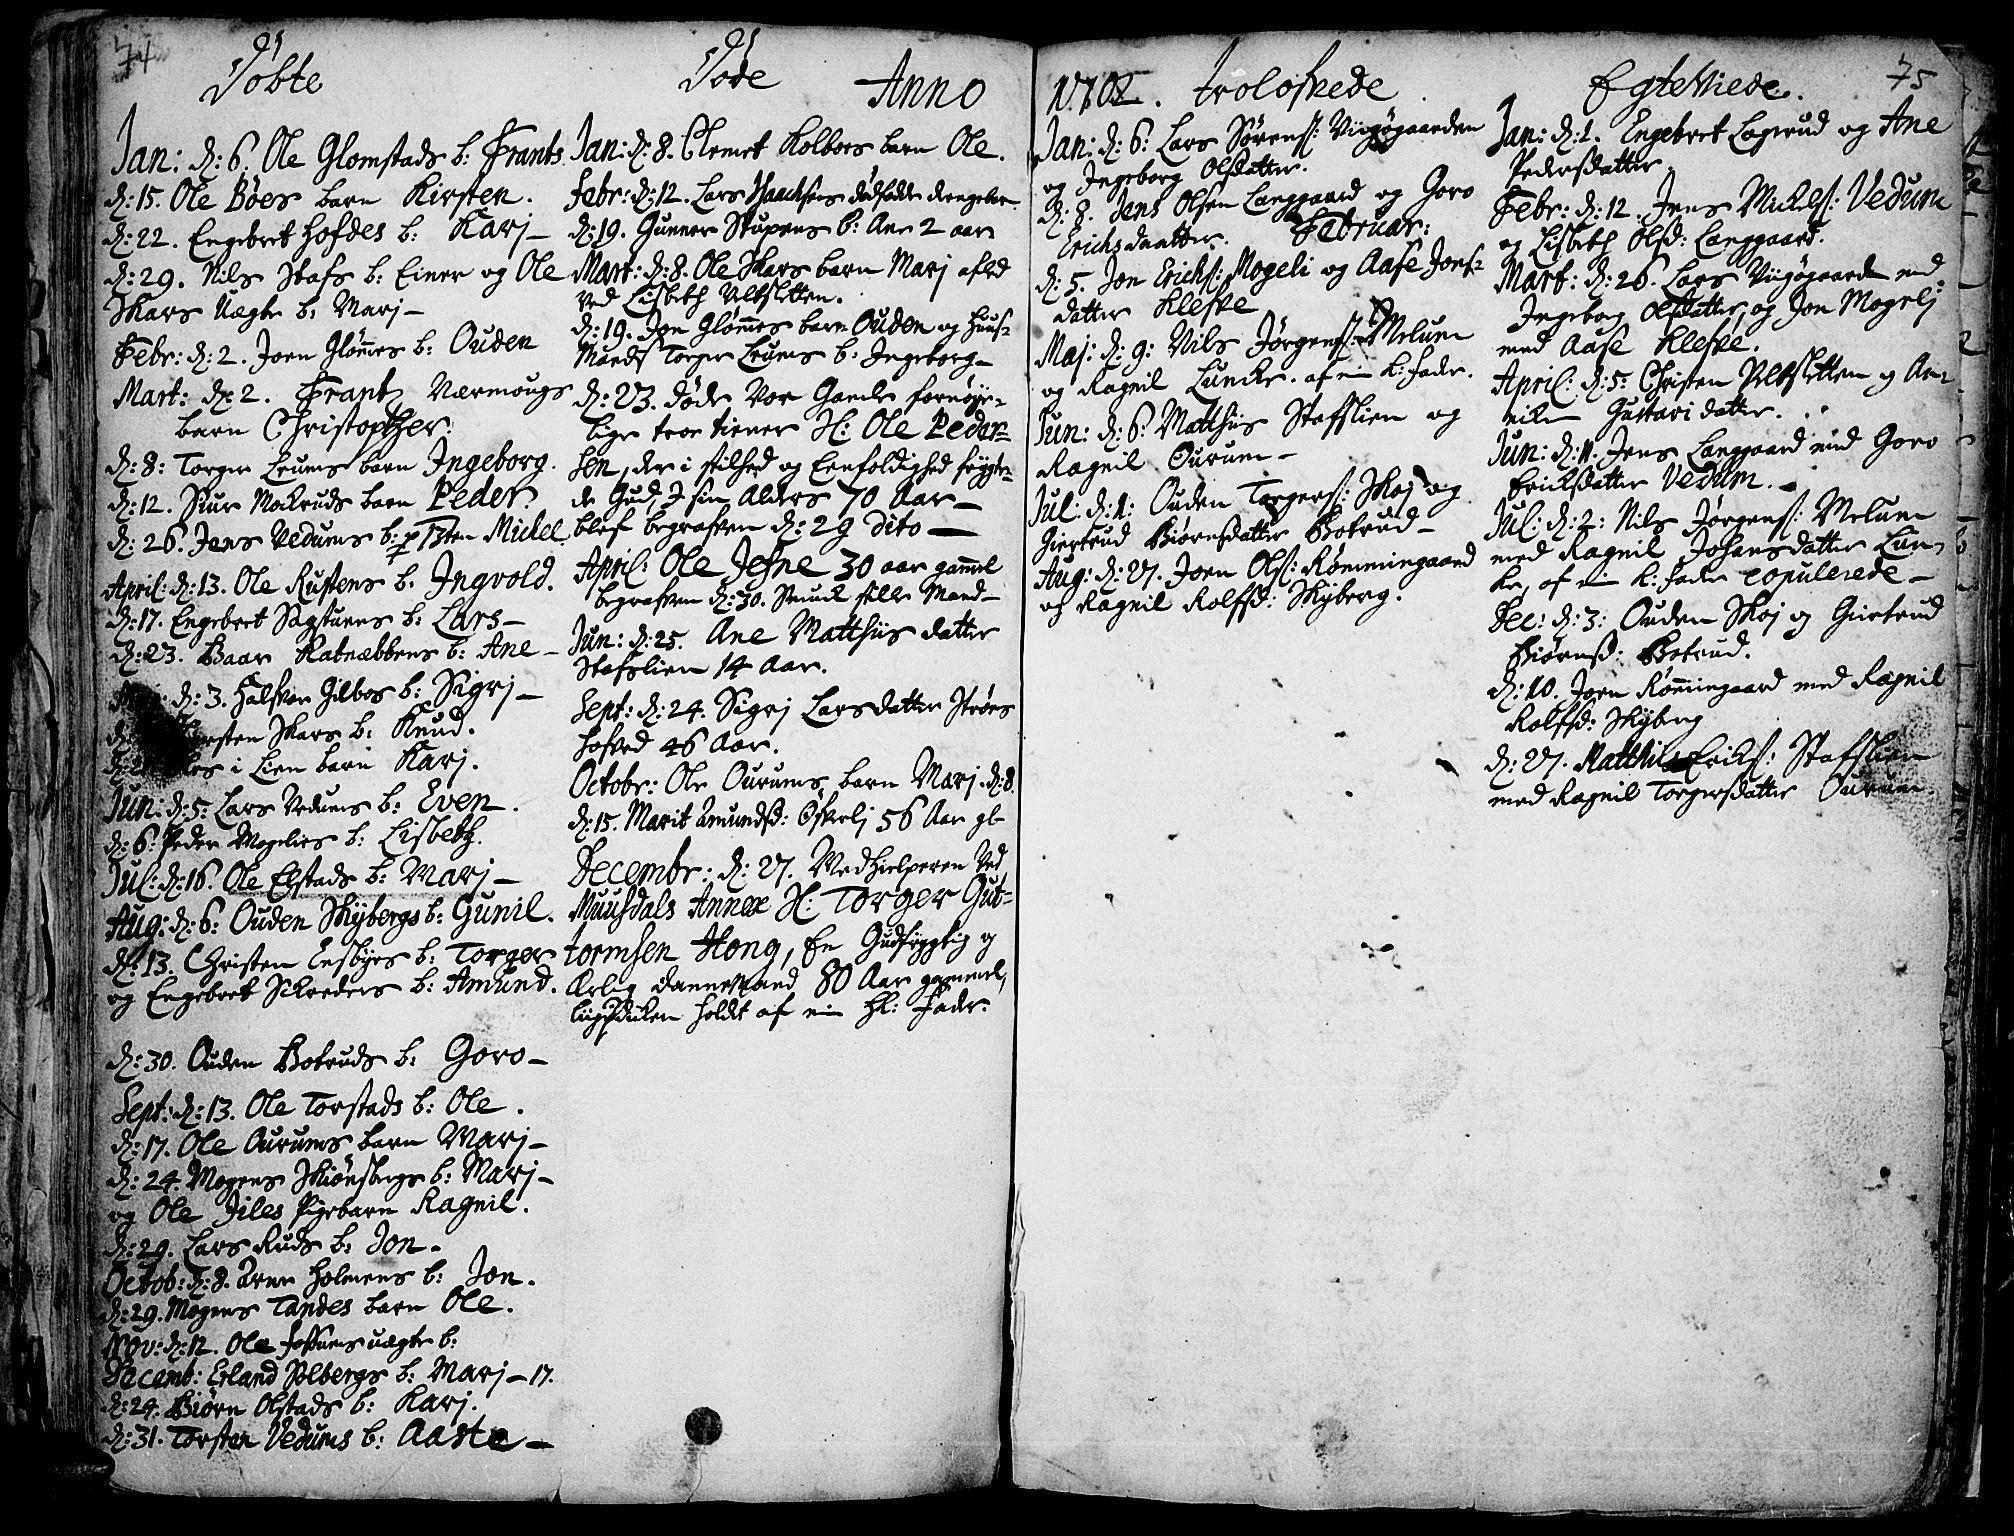 SAH, Øyer prestekontor, Ministerialbok nr. 1, 1671-1727, s. 74-75